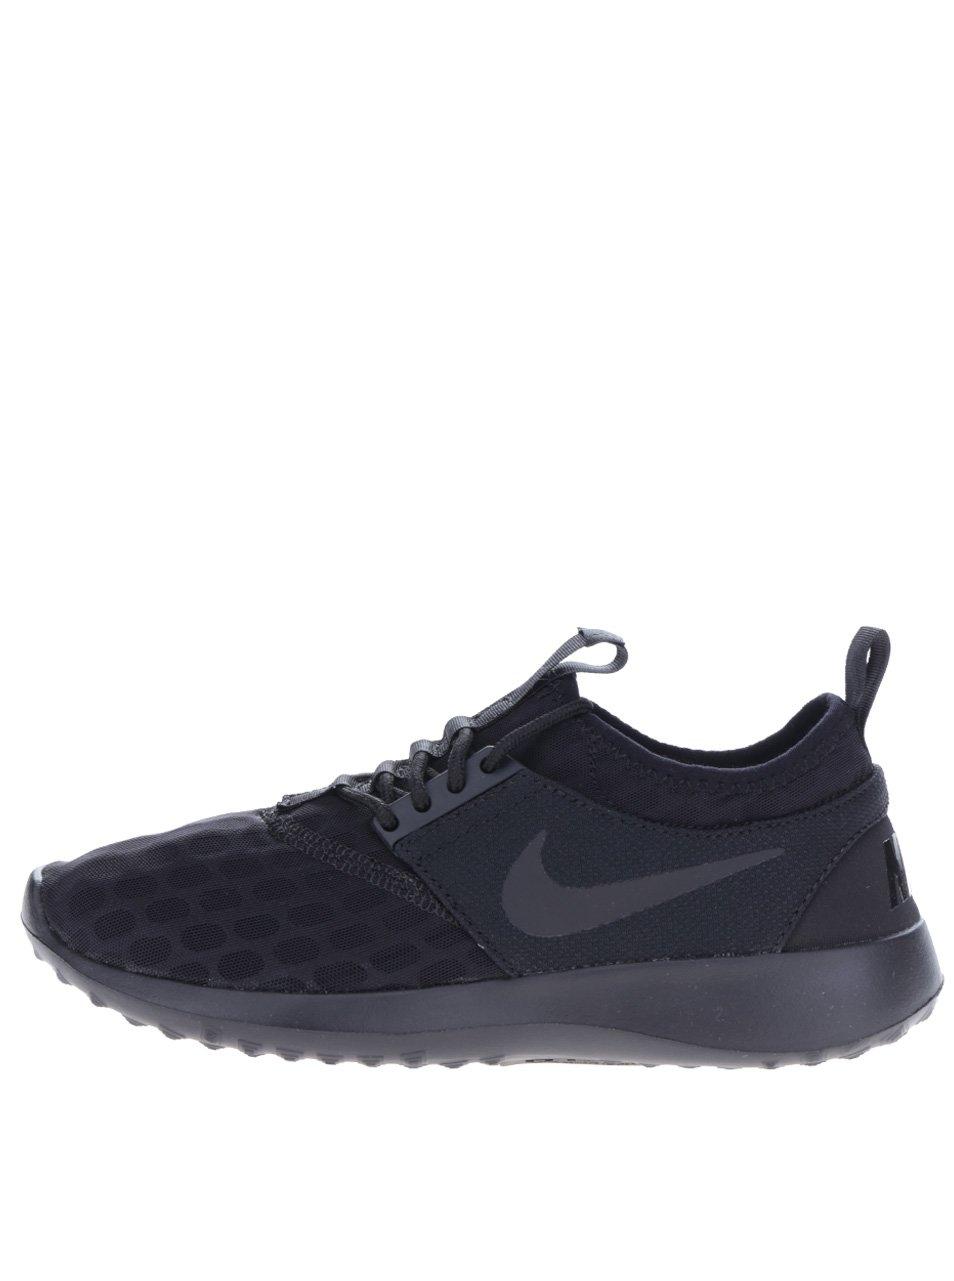 Čierne dámske tenisky Nike Juvenate